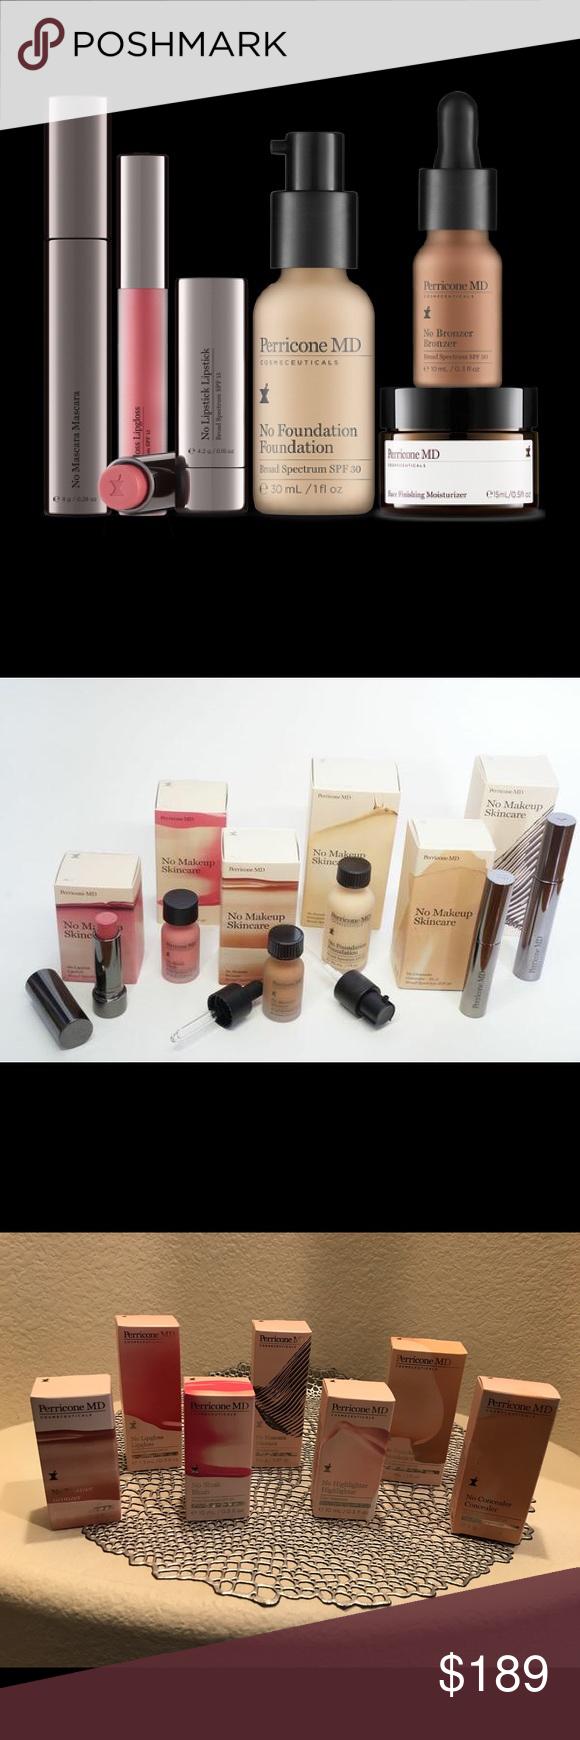 Perricone No Makeup Set Unopened brand new lipgloss